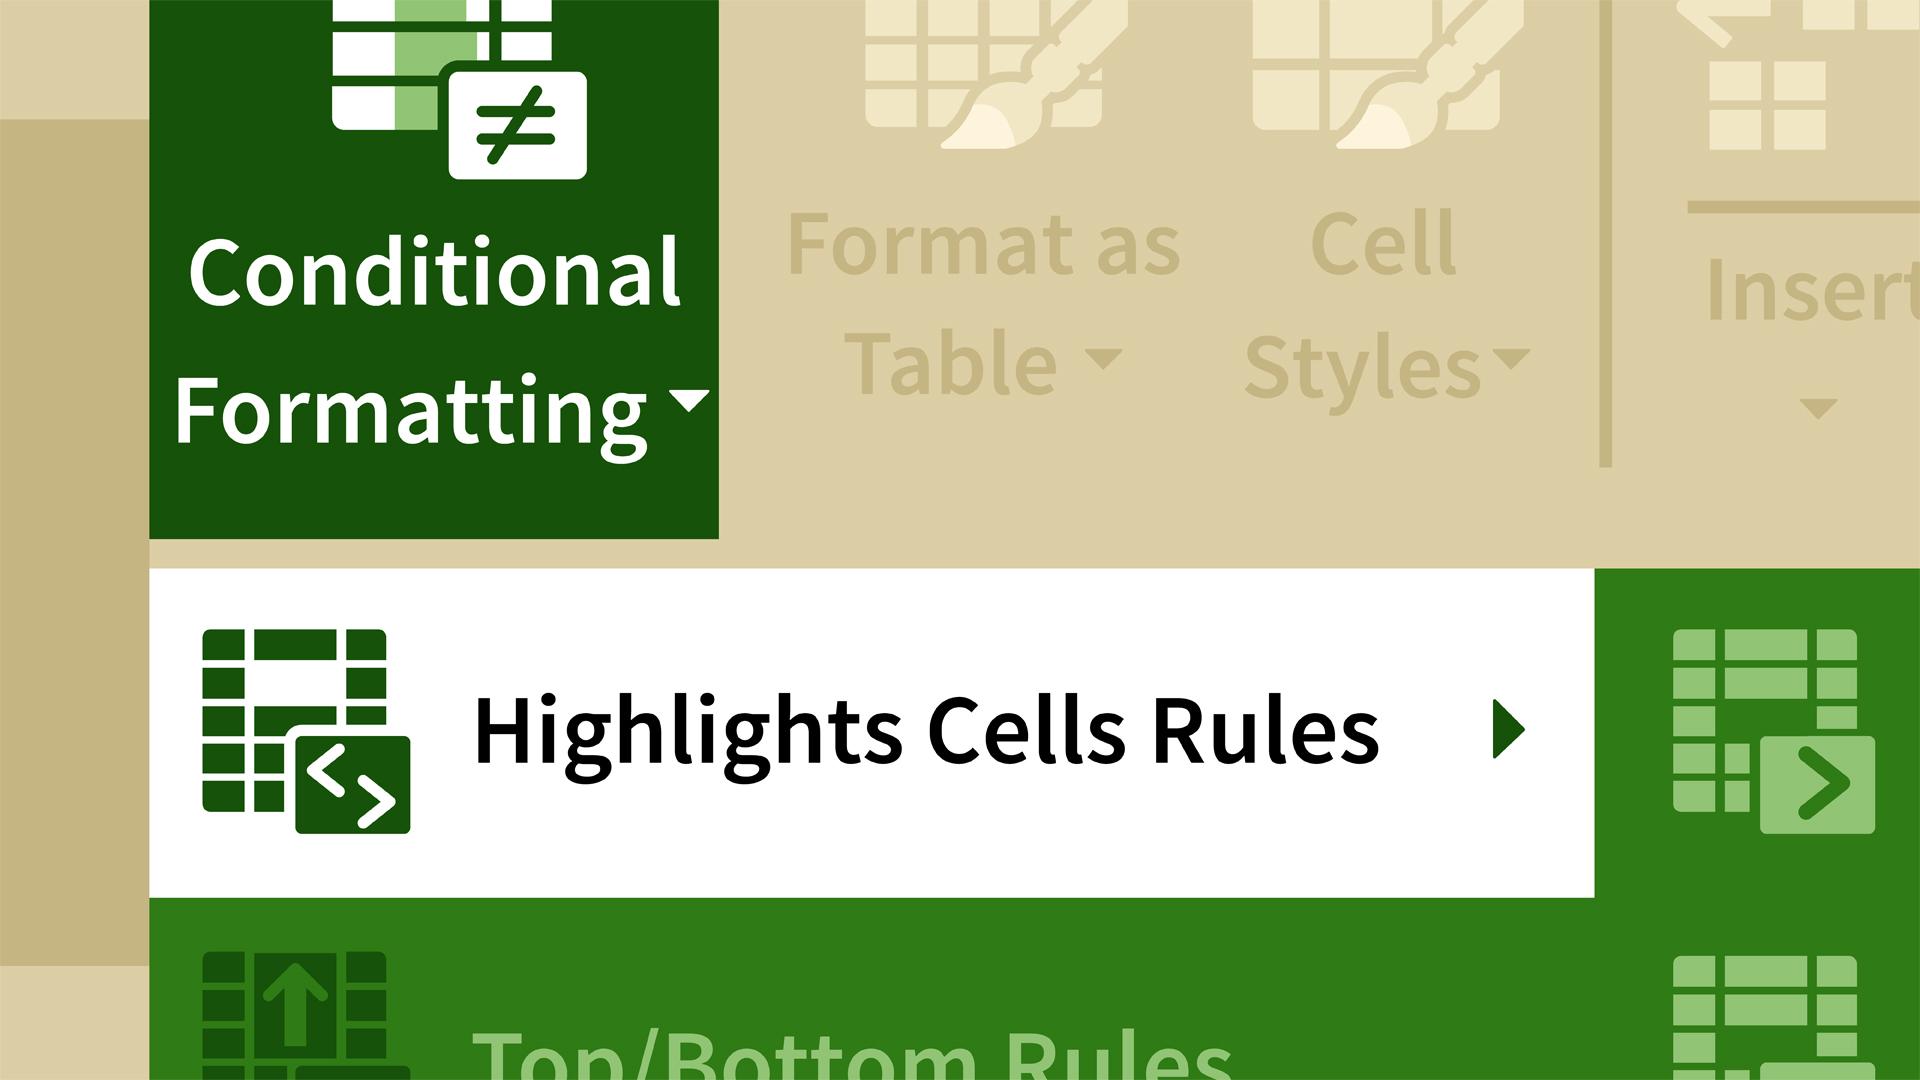 Excel 2016: Conditional Formatting in Depth